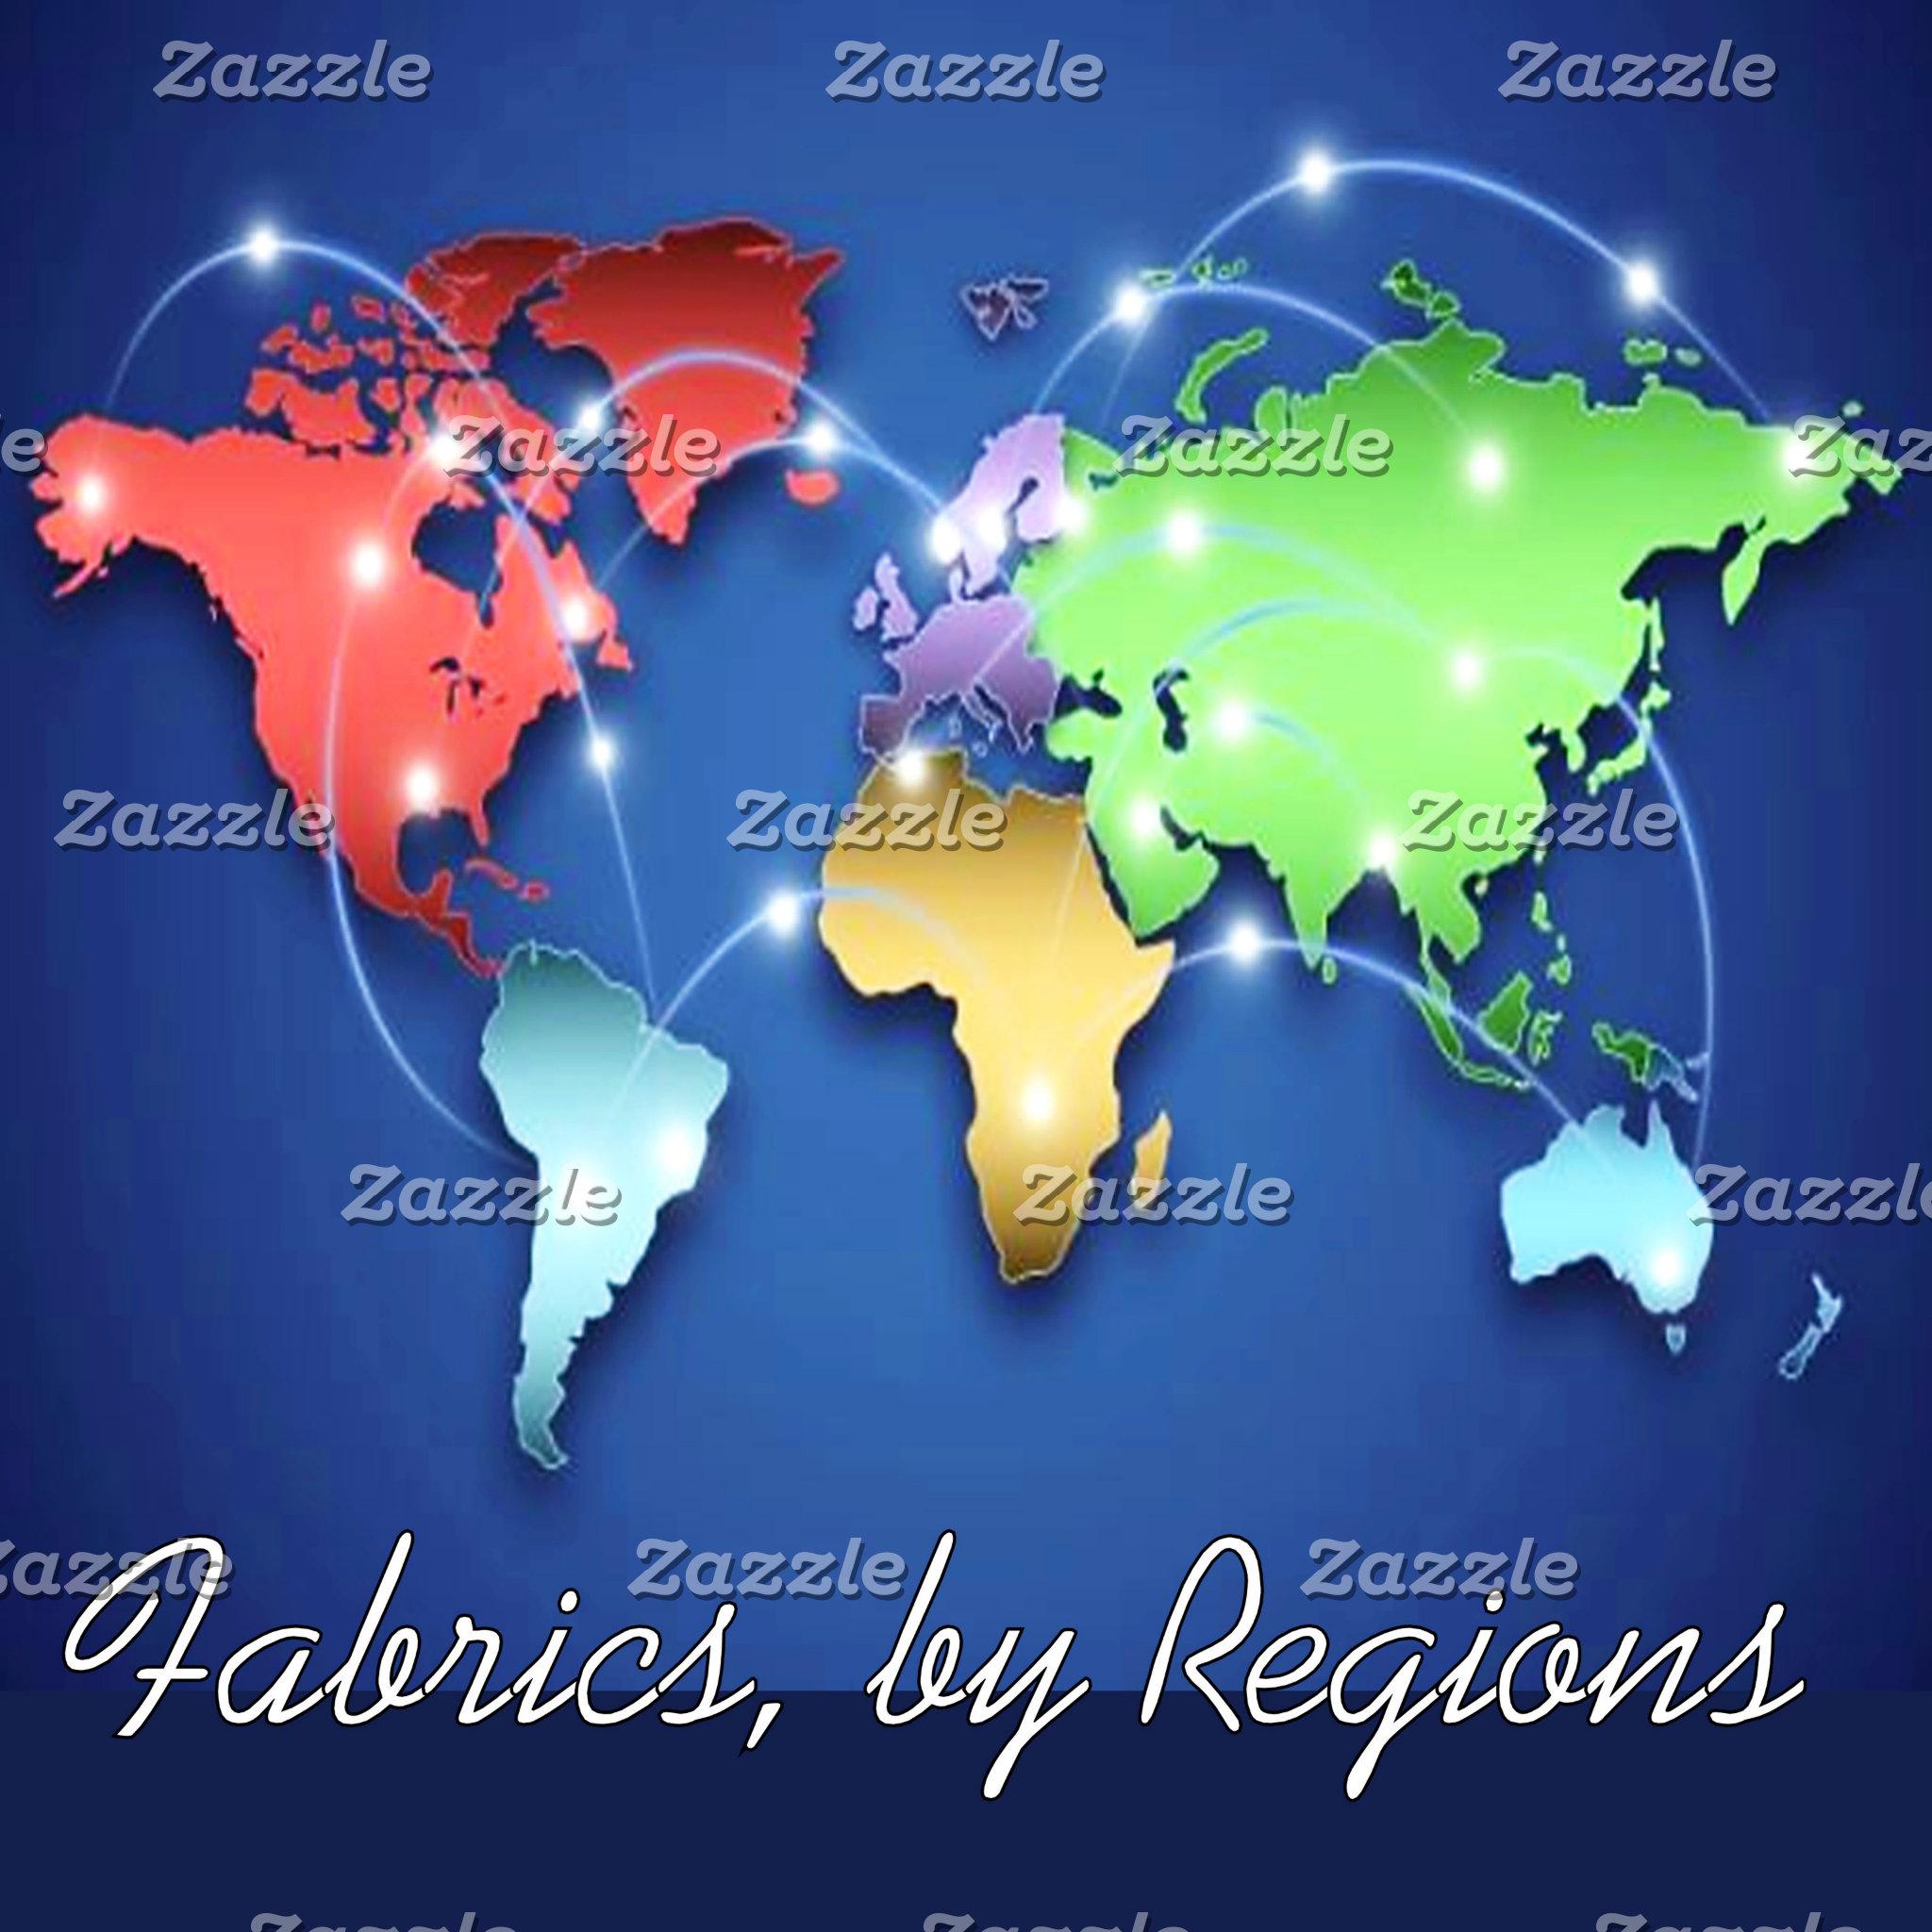 *Country, Regional, Fabrics